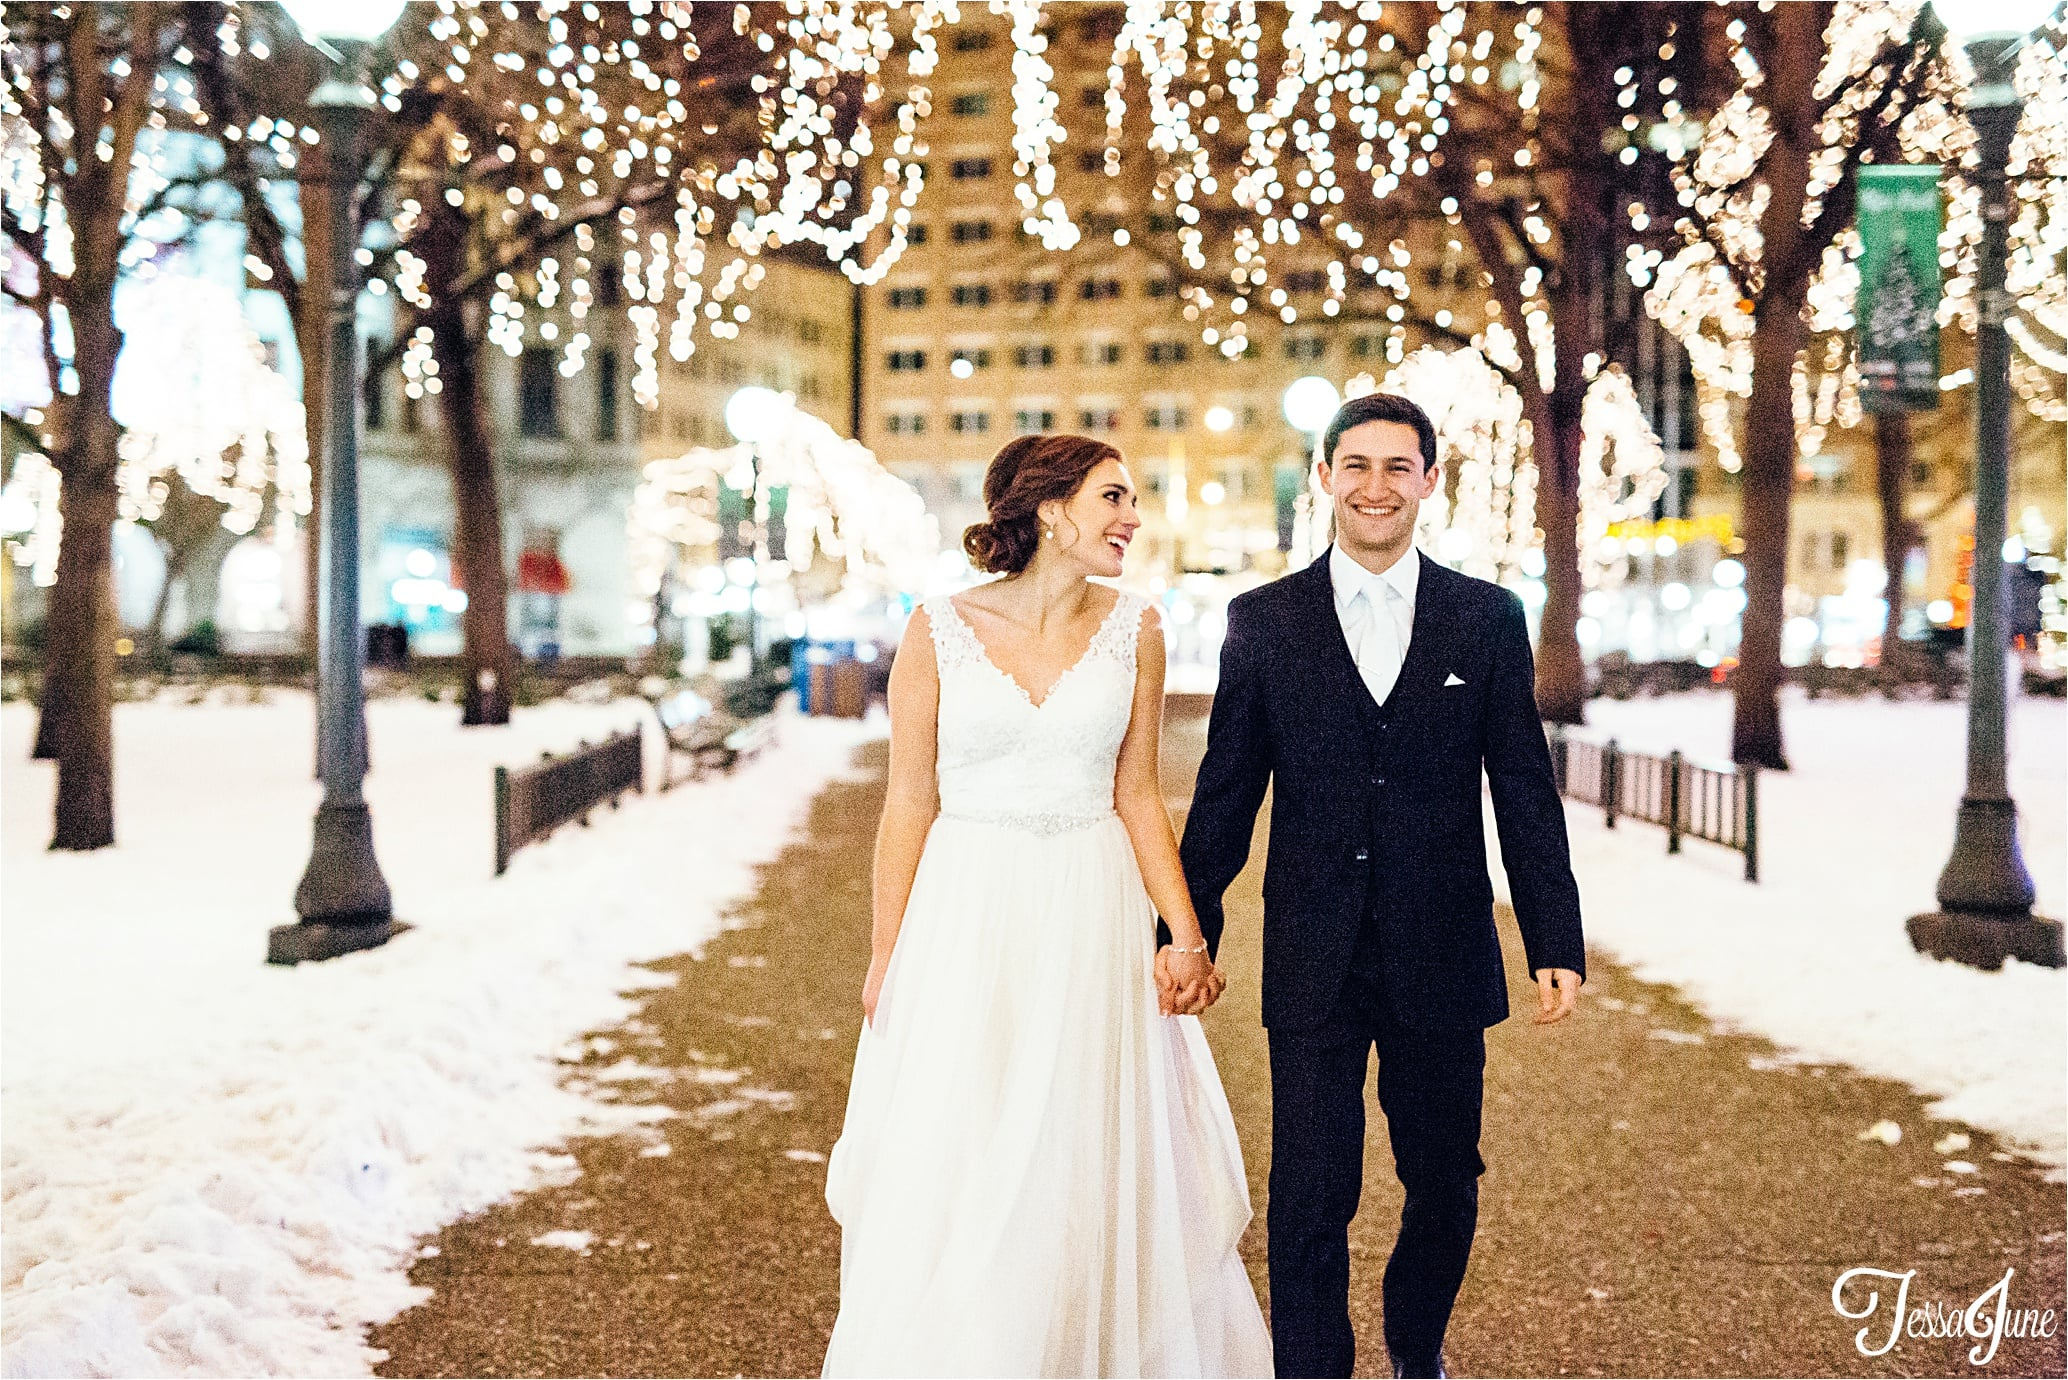 st-cloud-minnesota-wedding-photographer-rice-park-winter-maroon-dance